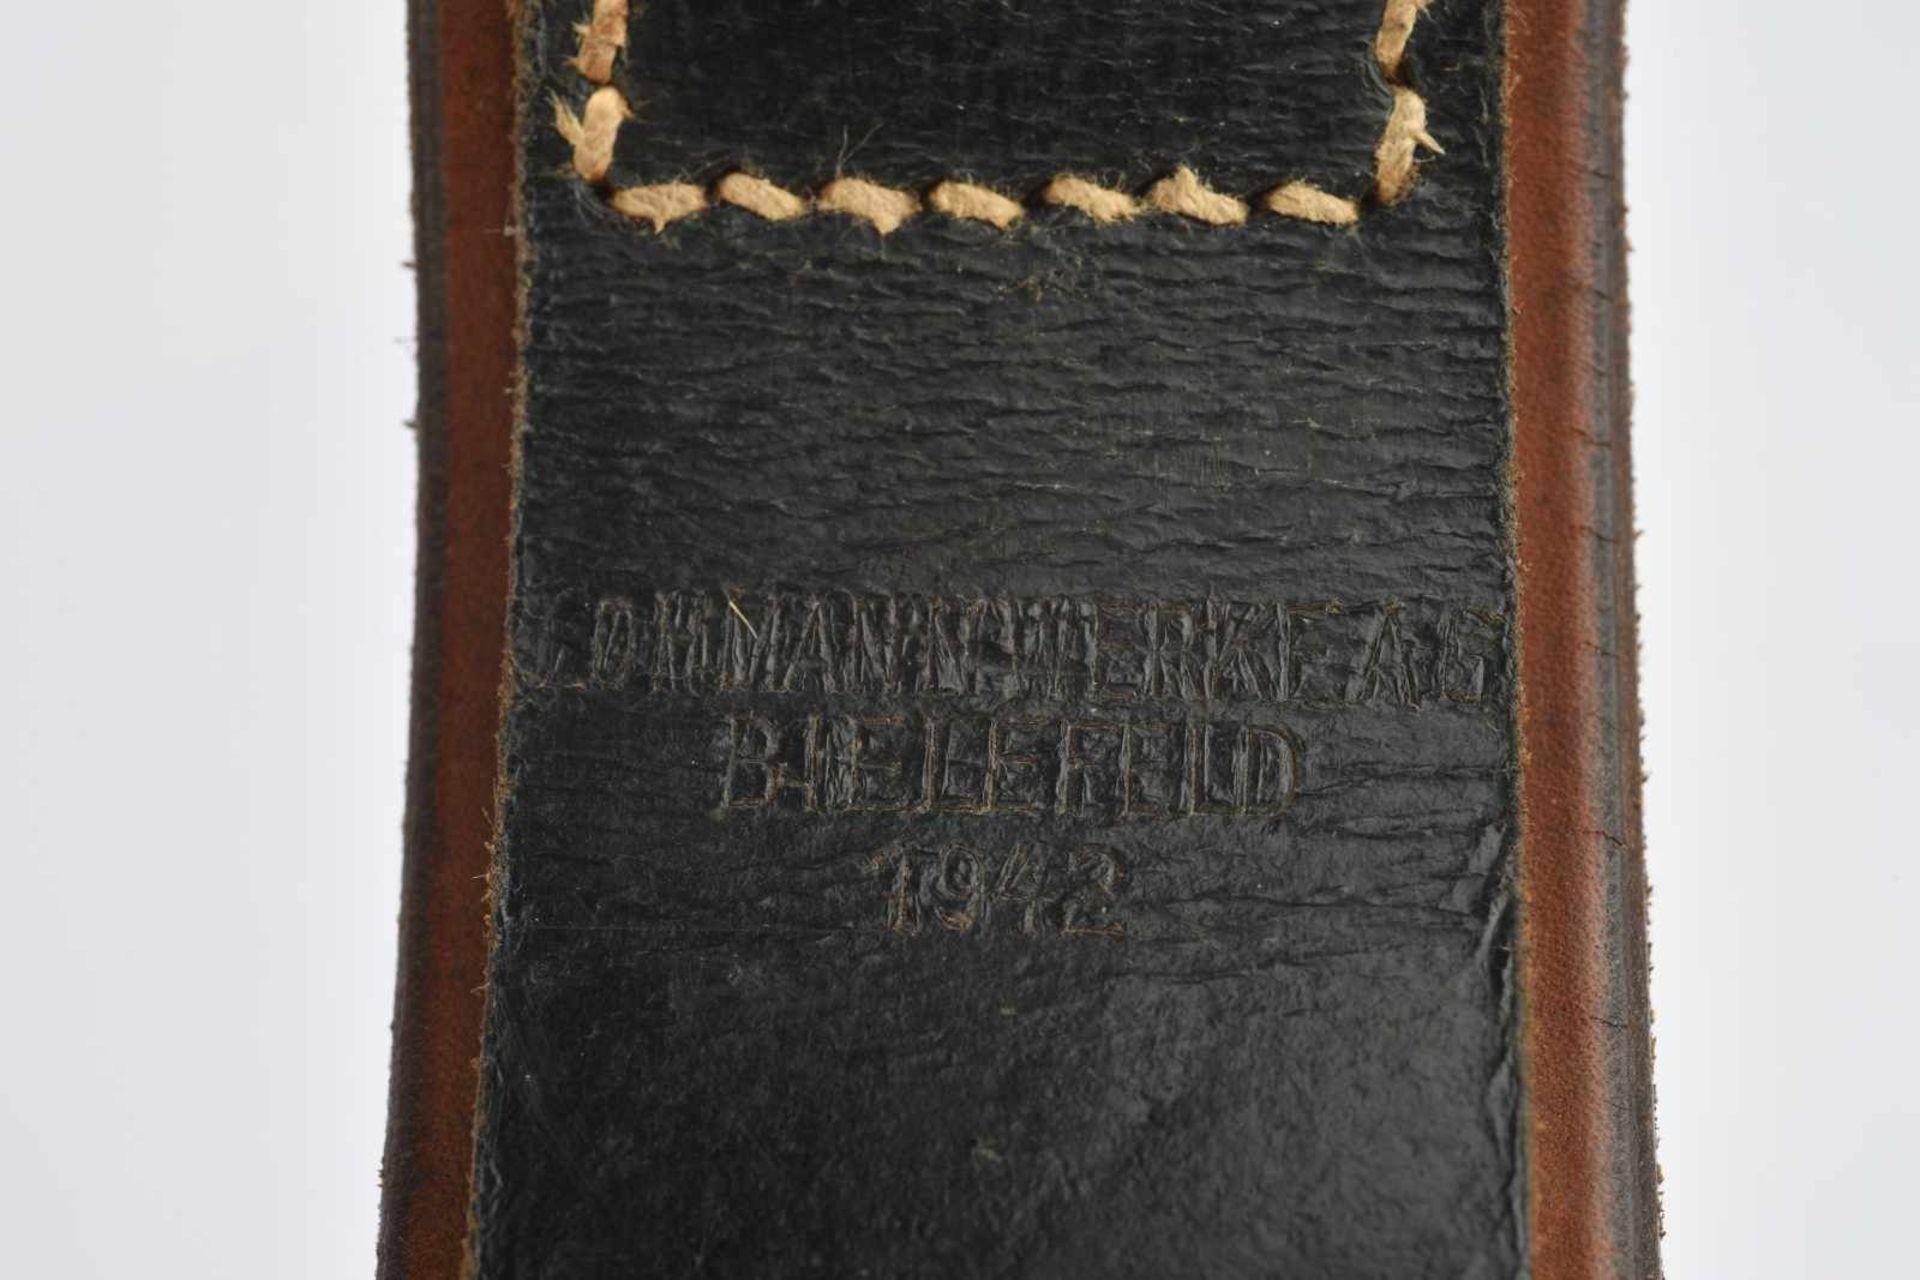 Ensemble de ceinturons en cuir comprenant un ceinturon en cuir sans marquage ni indication de - Bild 3 aus 3